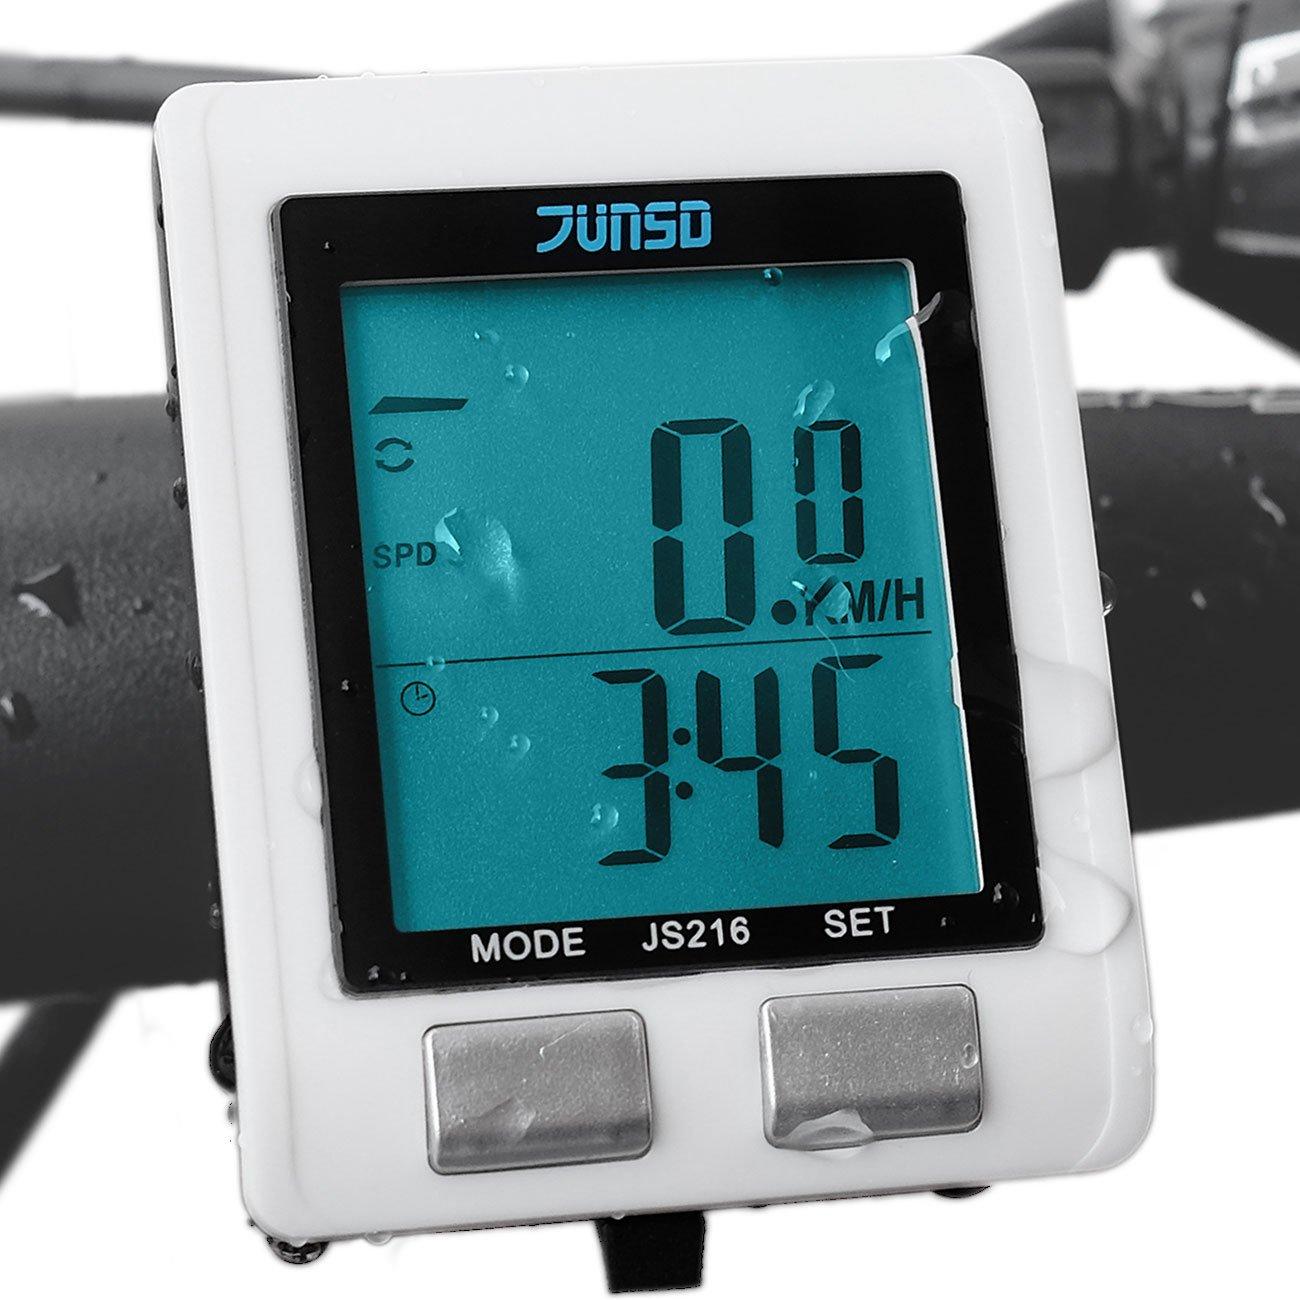 Outdoormaster JUNSD Wireless Bike Computer, Waterproof Multifunction Cycling Speedometer With Backlit Display